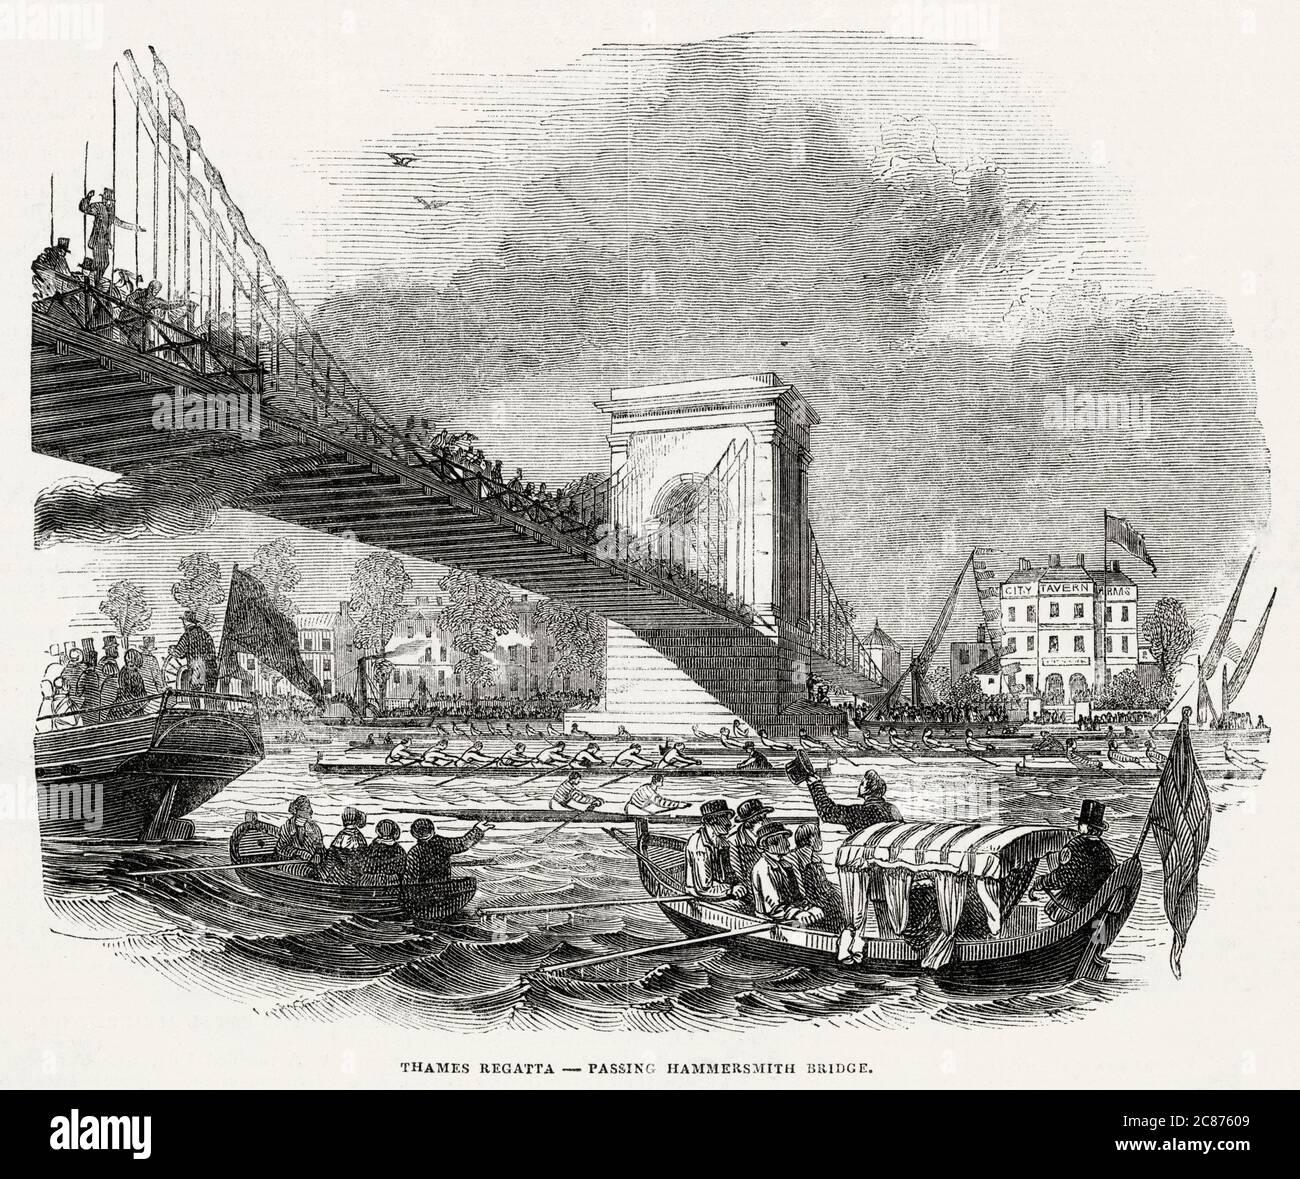 Rowing boats passing Hammersmith bridge.     Date: 1846 Stock Photo